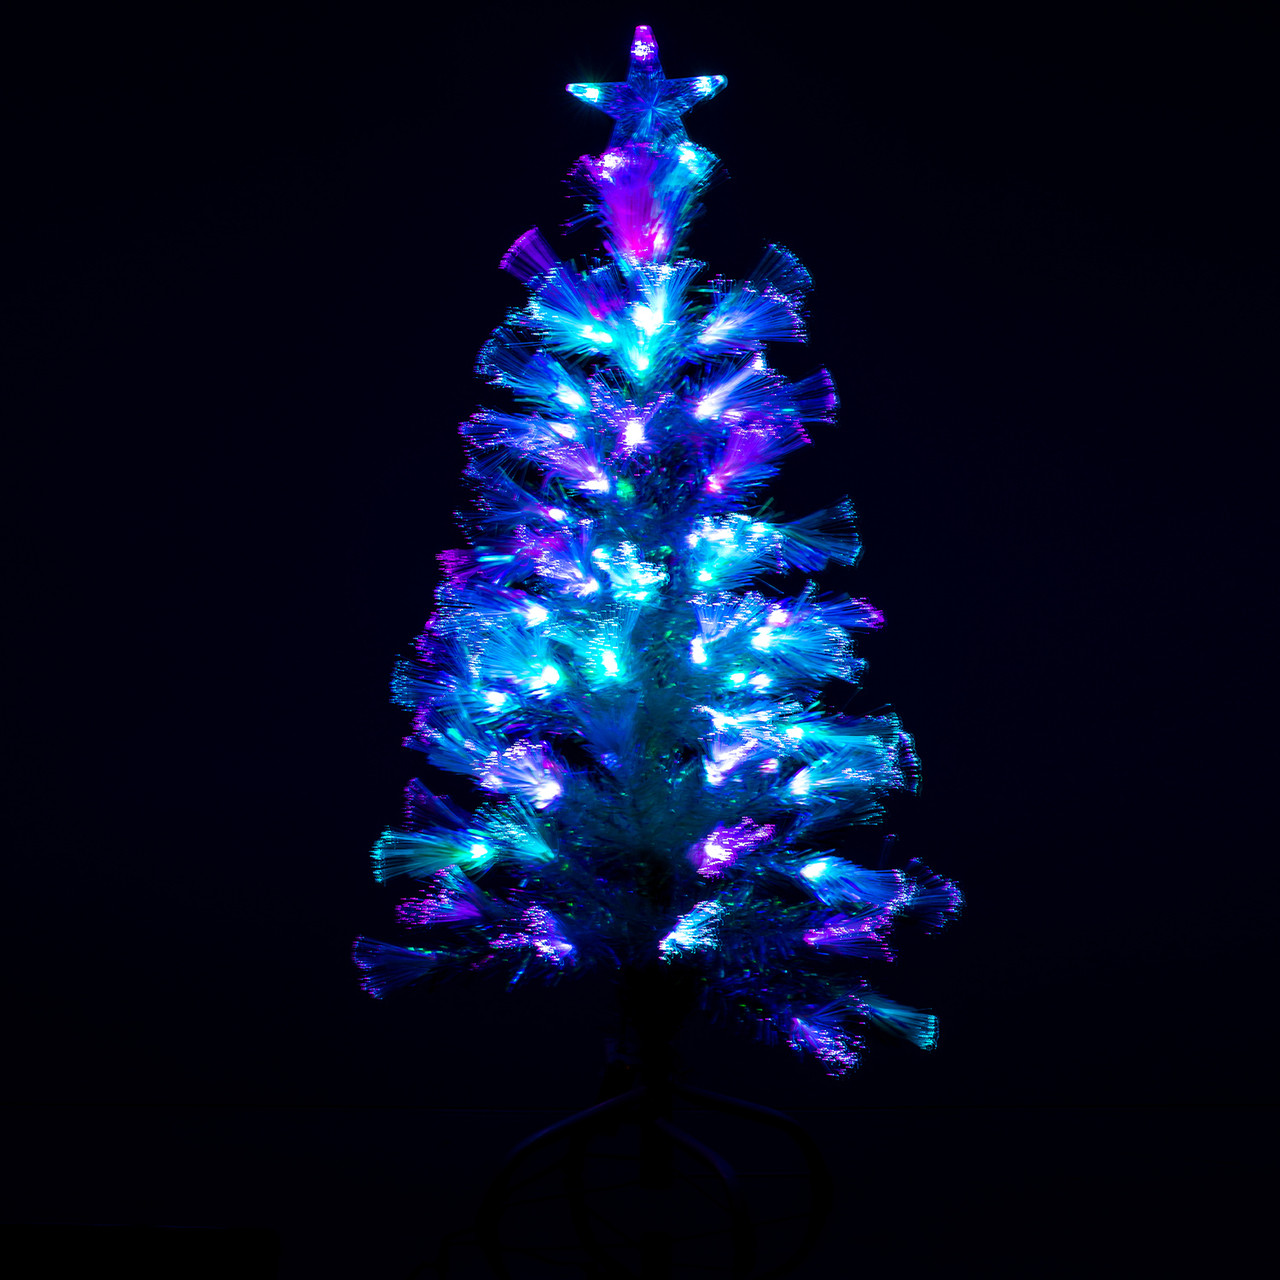 Christmas Tree With Lights.Fibre Optic Christmas Tree With Light Show